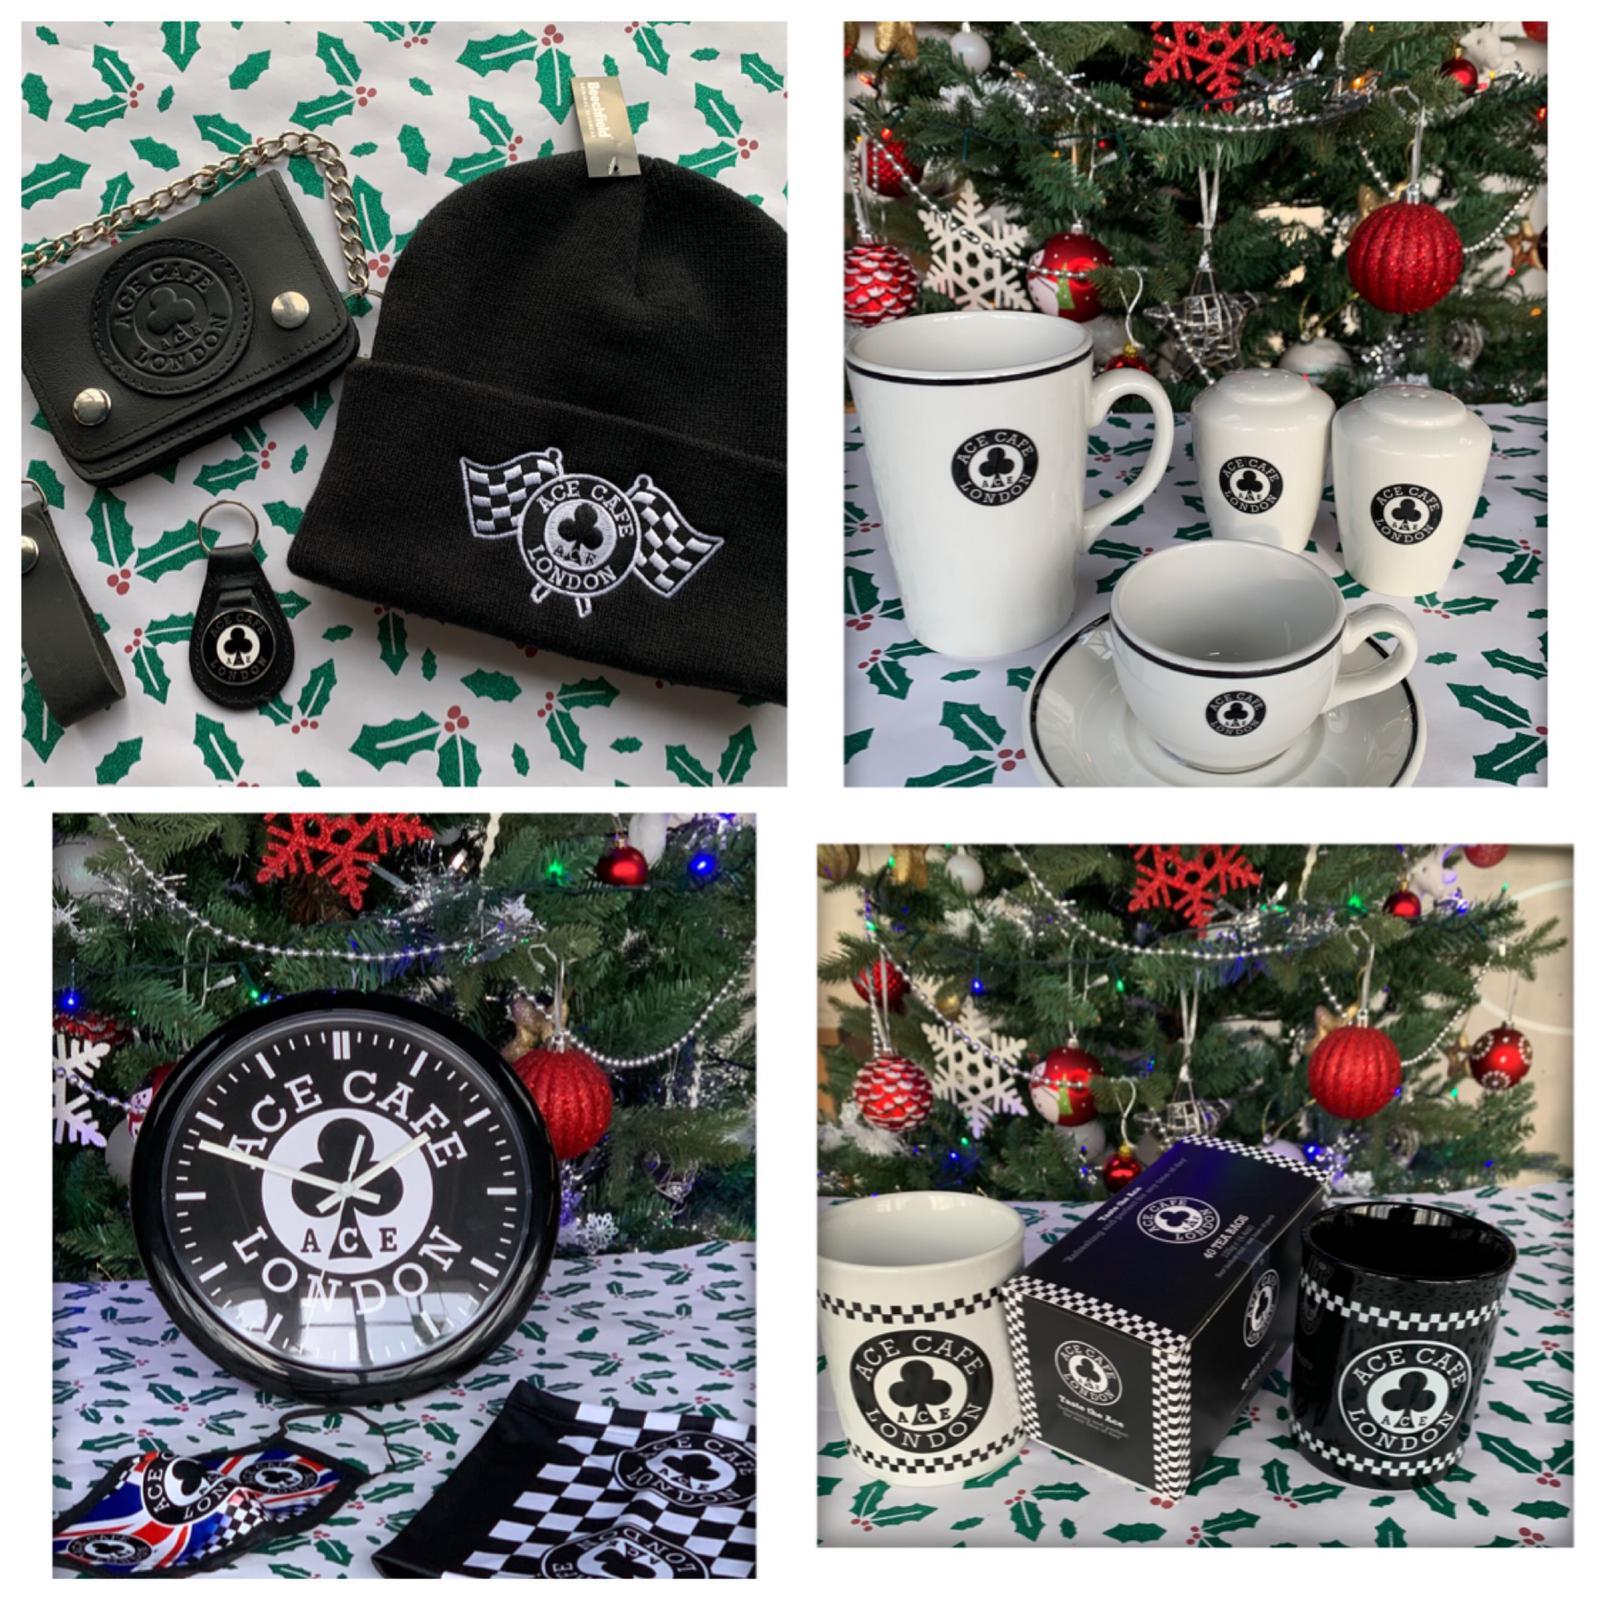 Christmas Gift Ideas Ace Cafe London